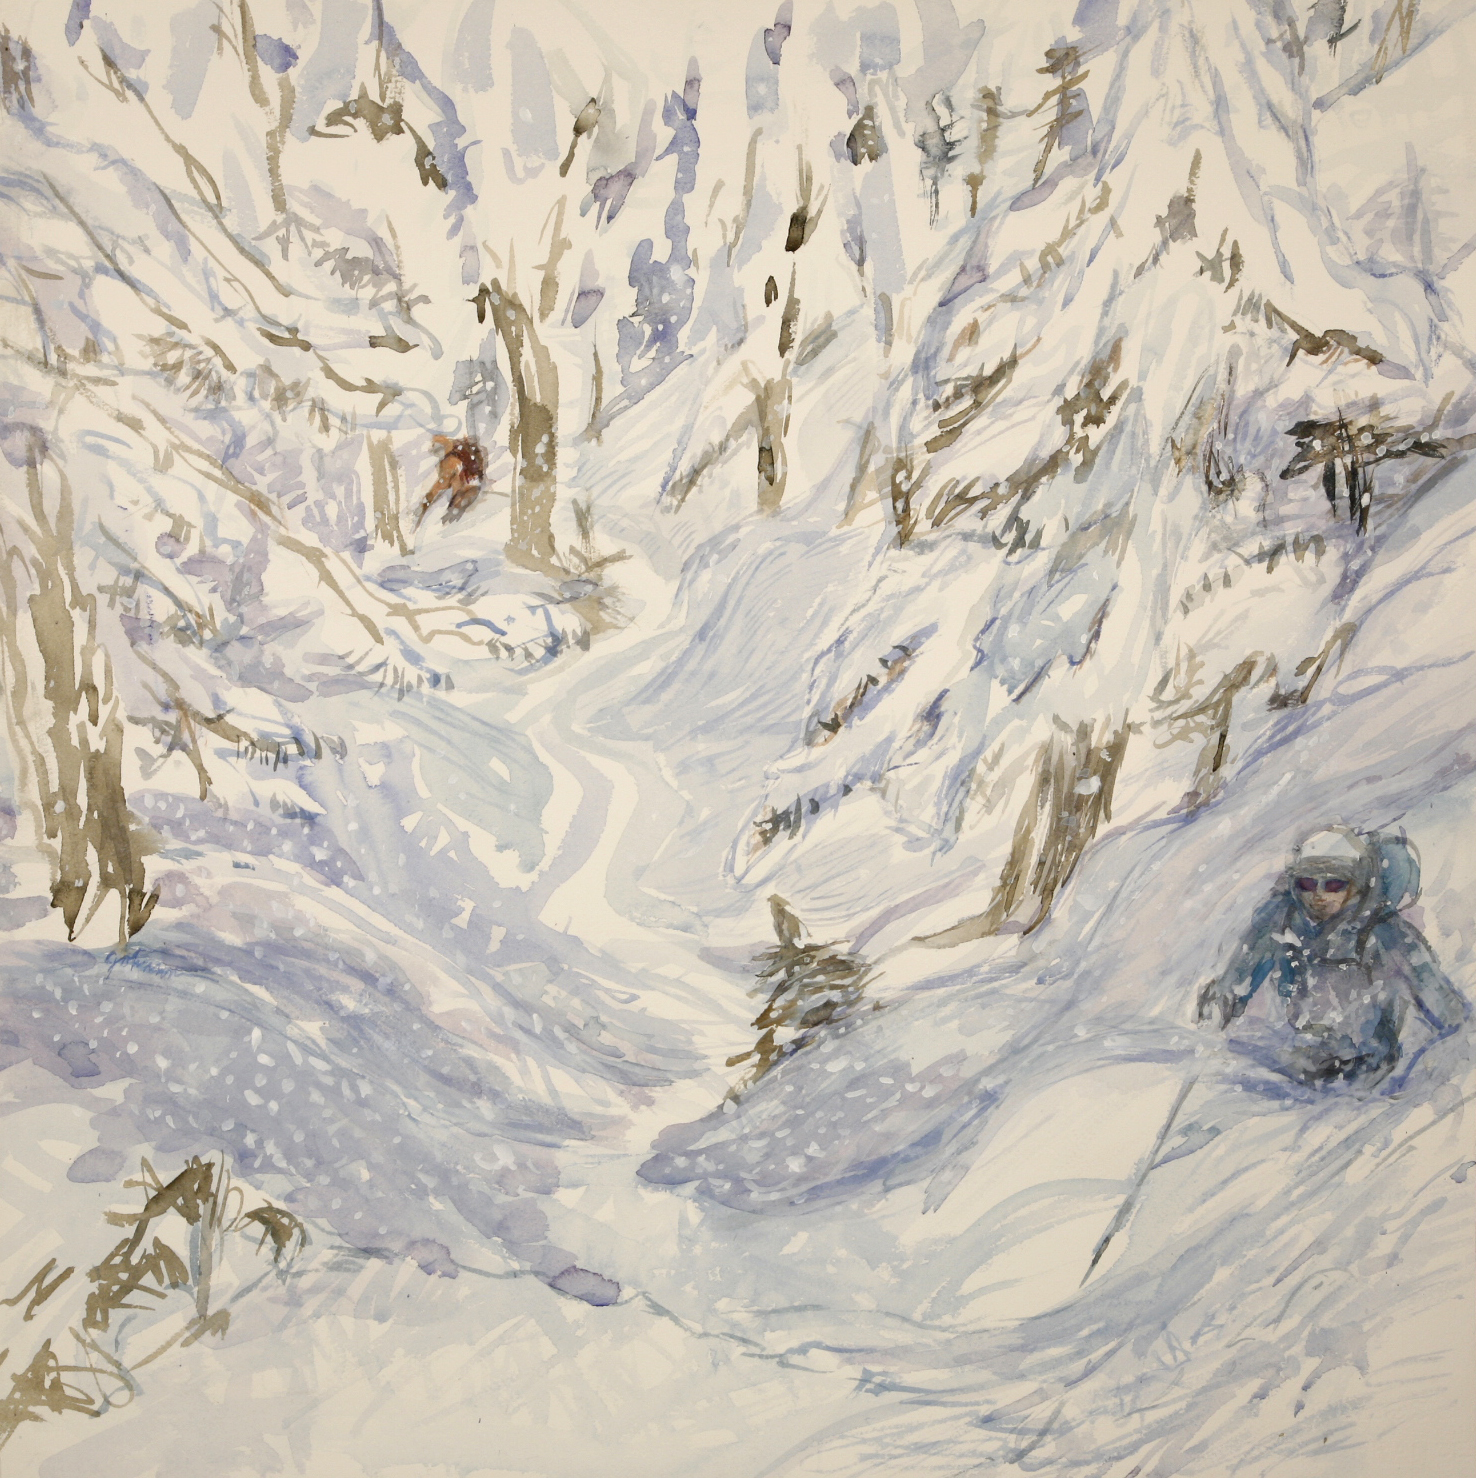 powder in trees zermatt alpine painting